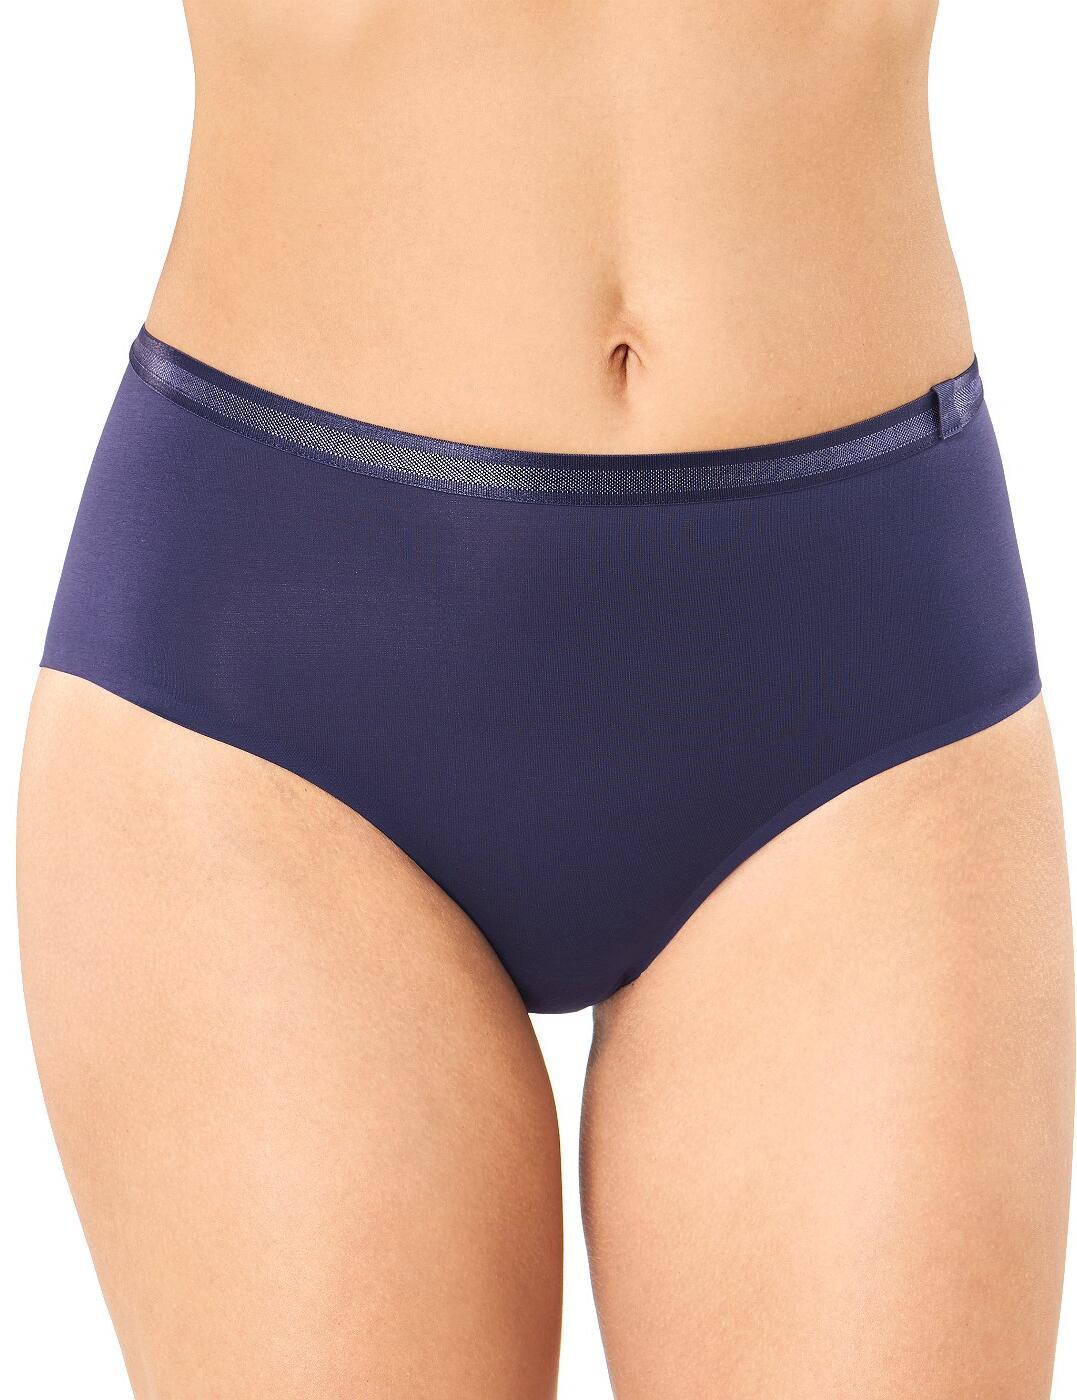 10186105 Sloggi S Serenity Mid Waist Panty Brief - 10186105 Indigo Blue